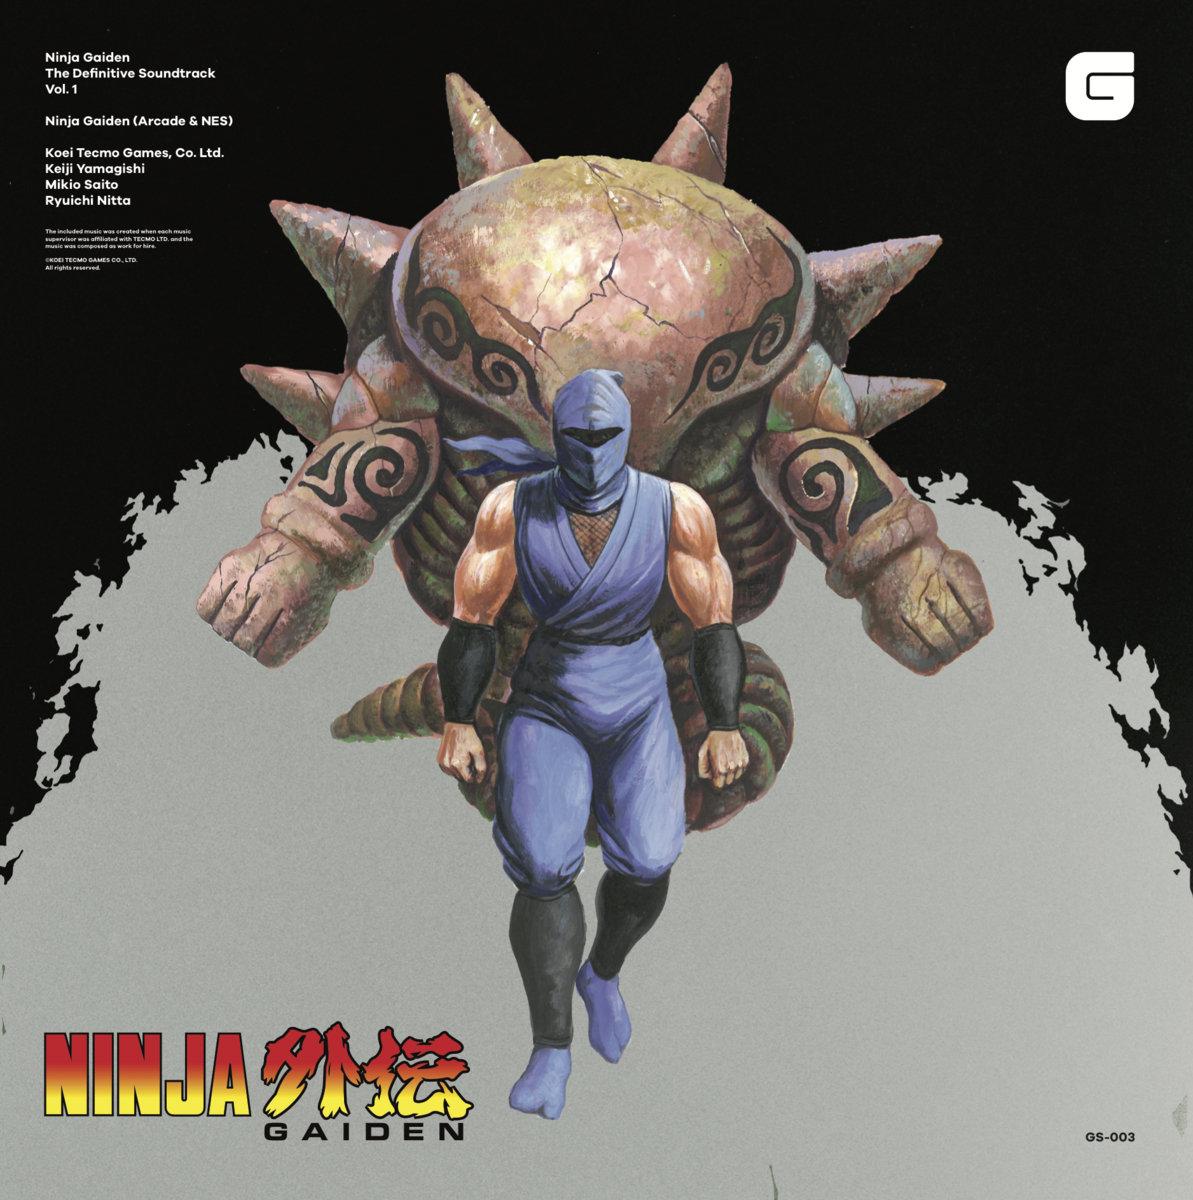 Ninja Gaiden The Definitive Soundtrack Vol 1 Koei Tecmo Games Co Ltd Brave Wave Productions